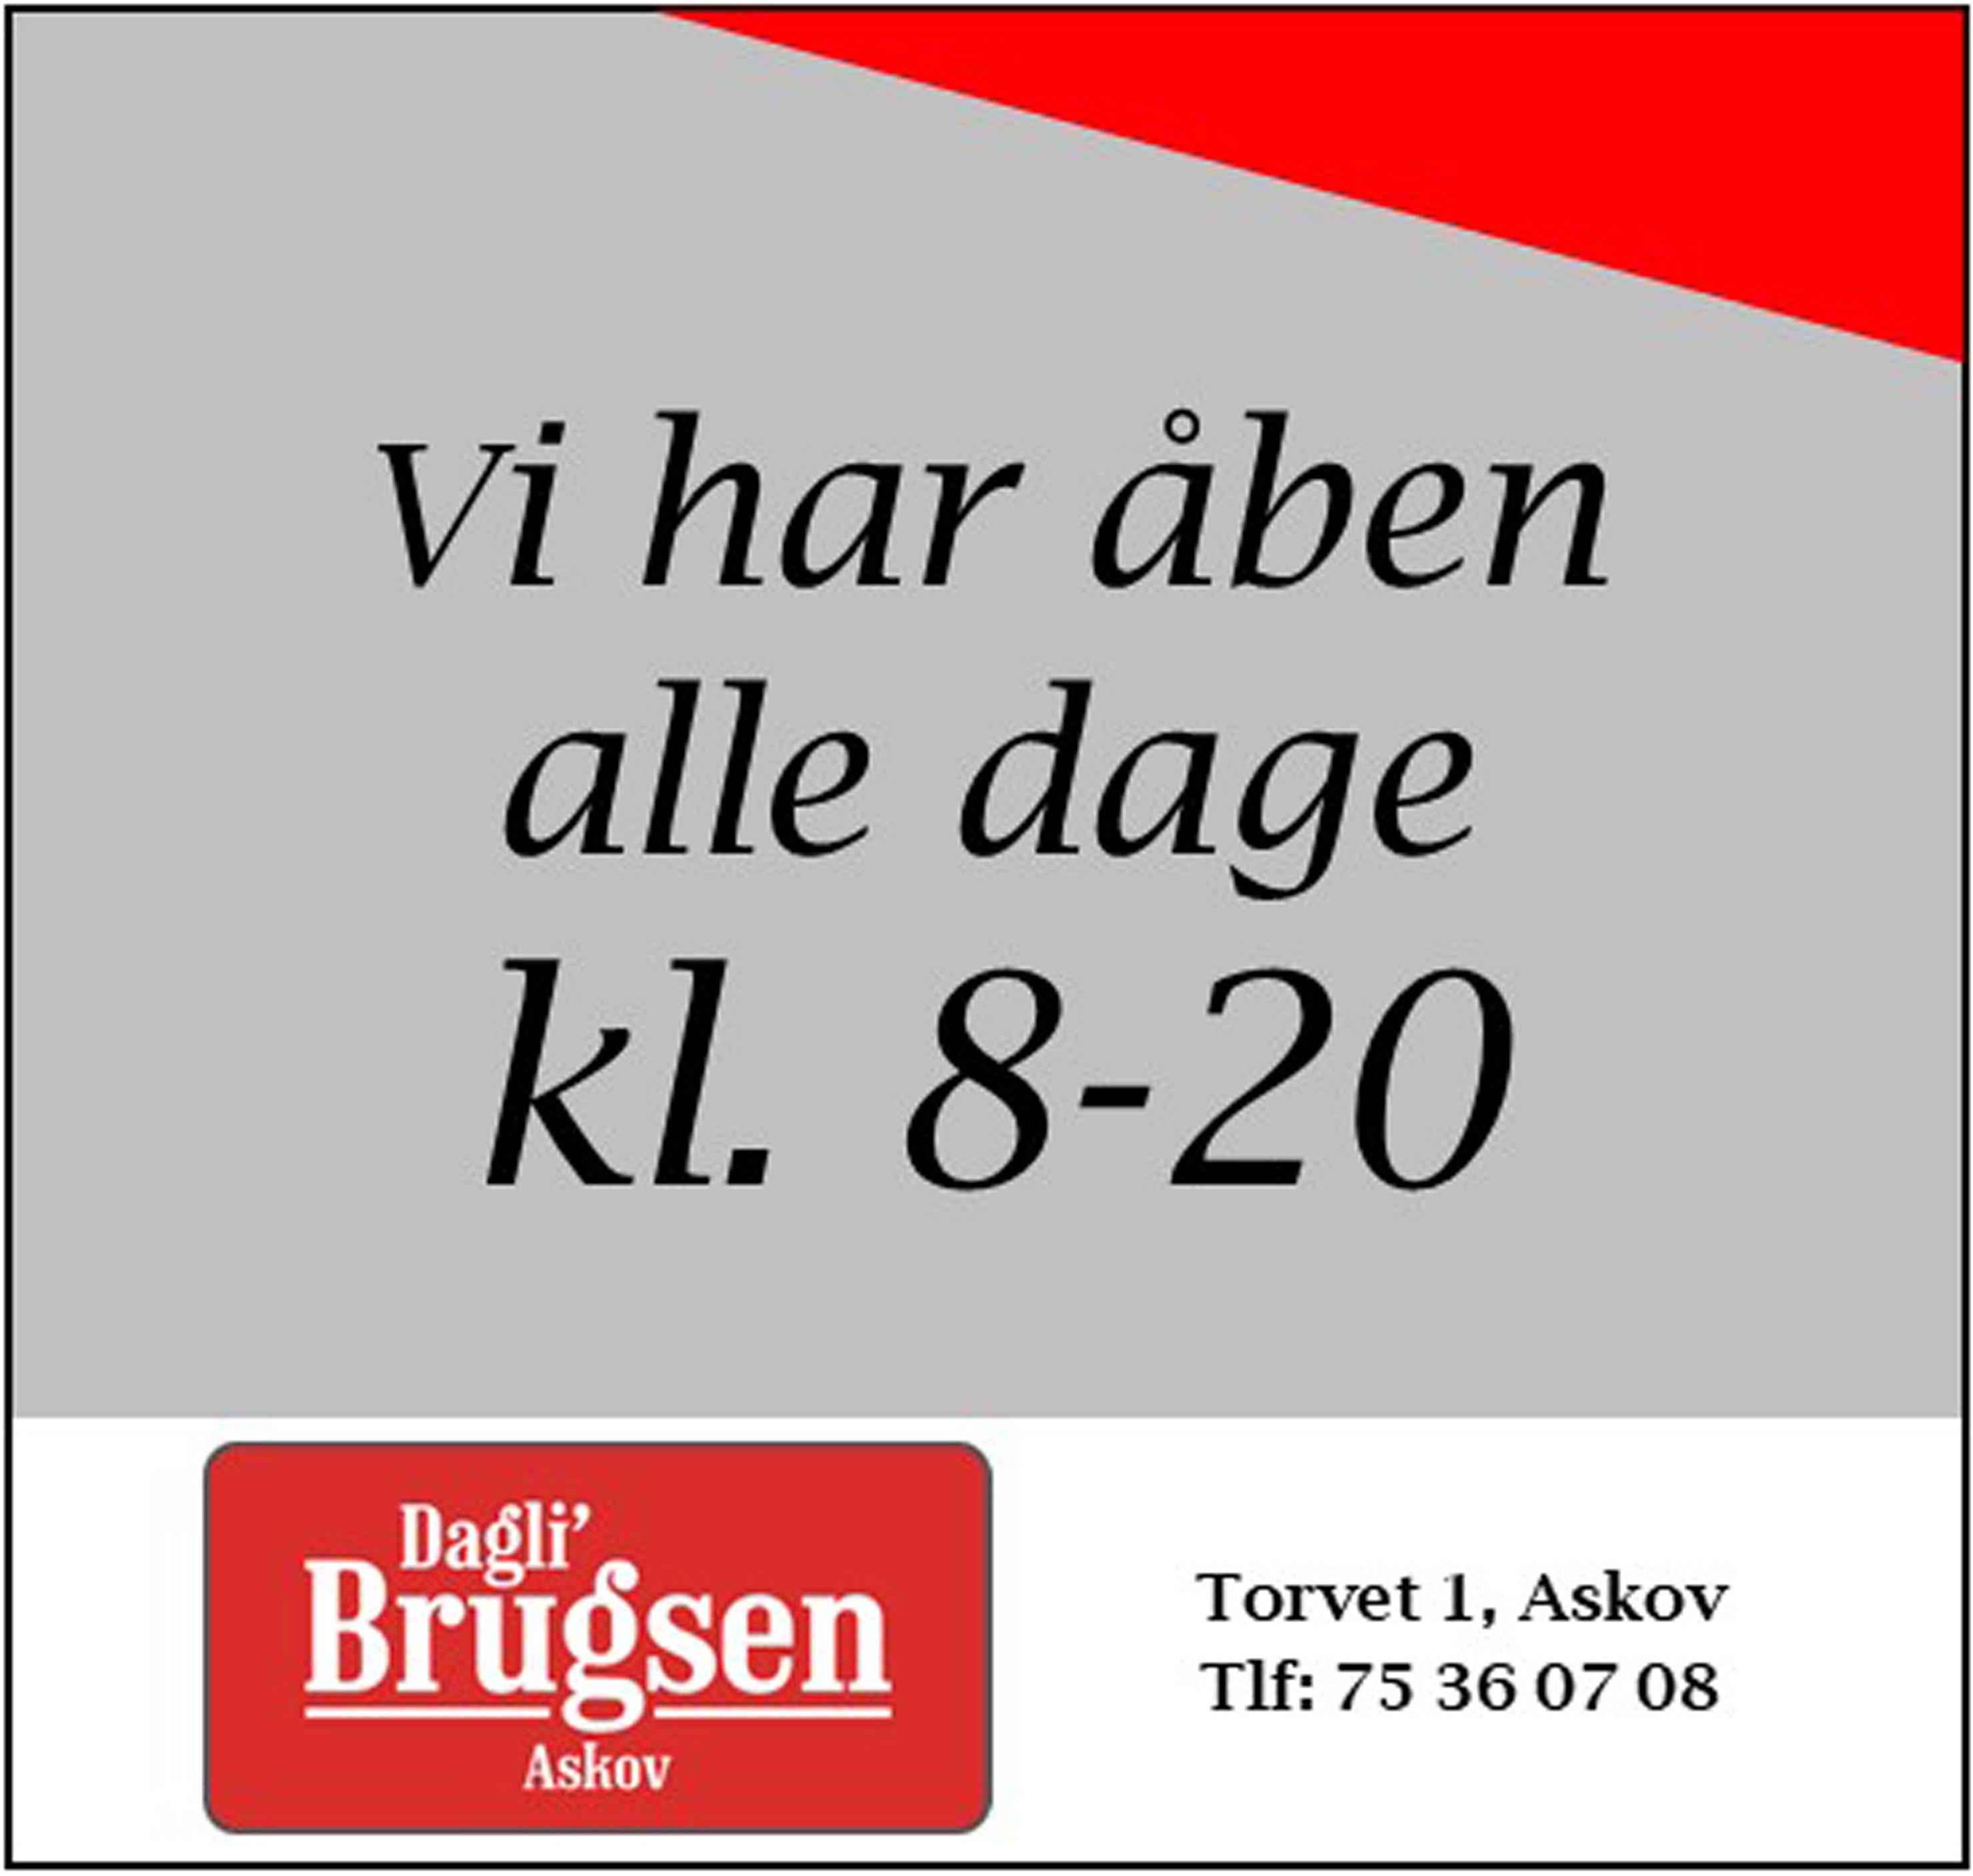 Dagli-Brugsen - 22-21